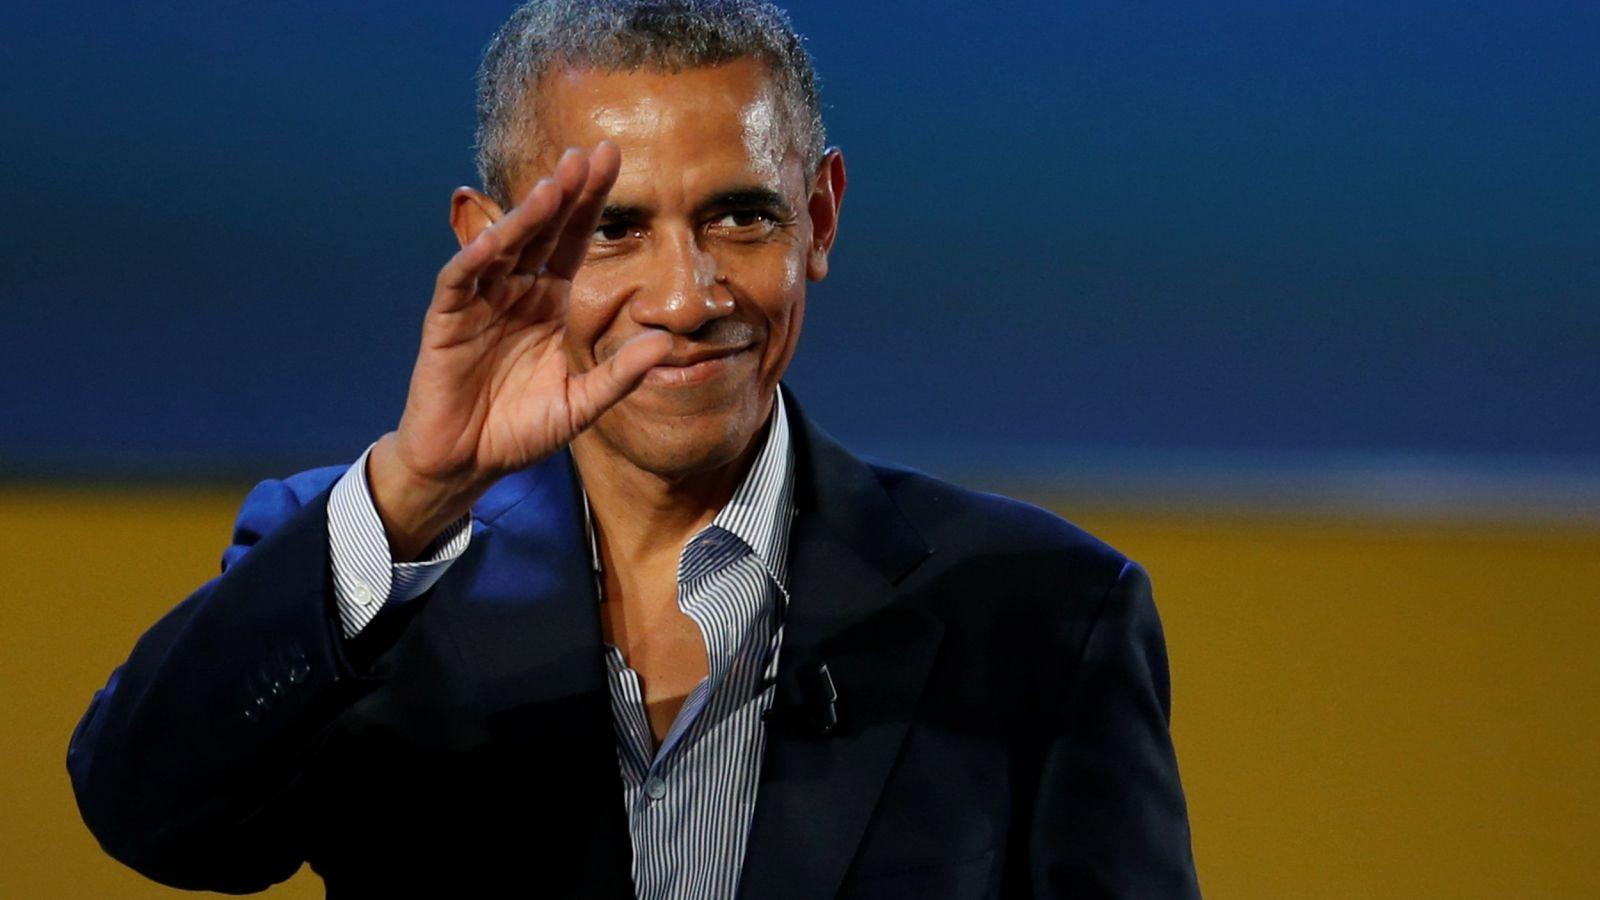 Barack Obama: Δίνει το κινητό του στο Twitter και προτρέπει τους Αμερικανούς να ψηφίσουν